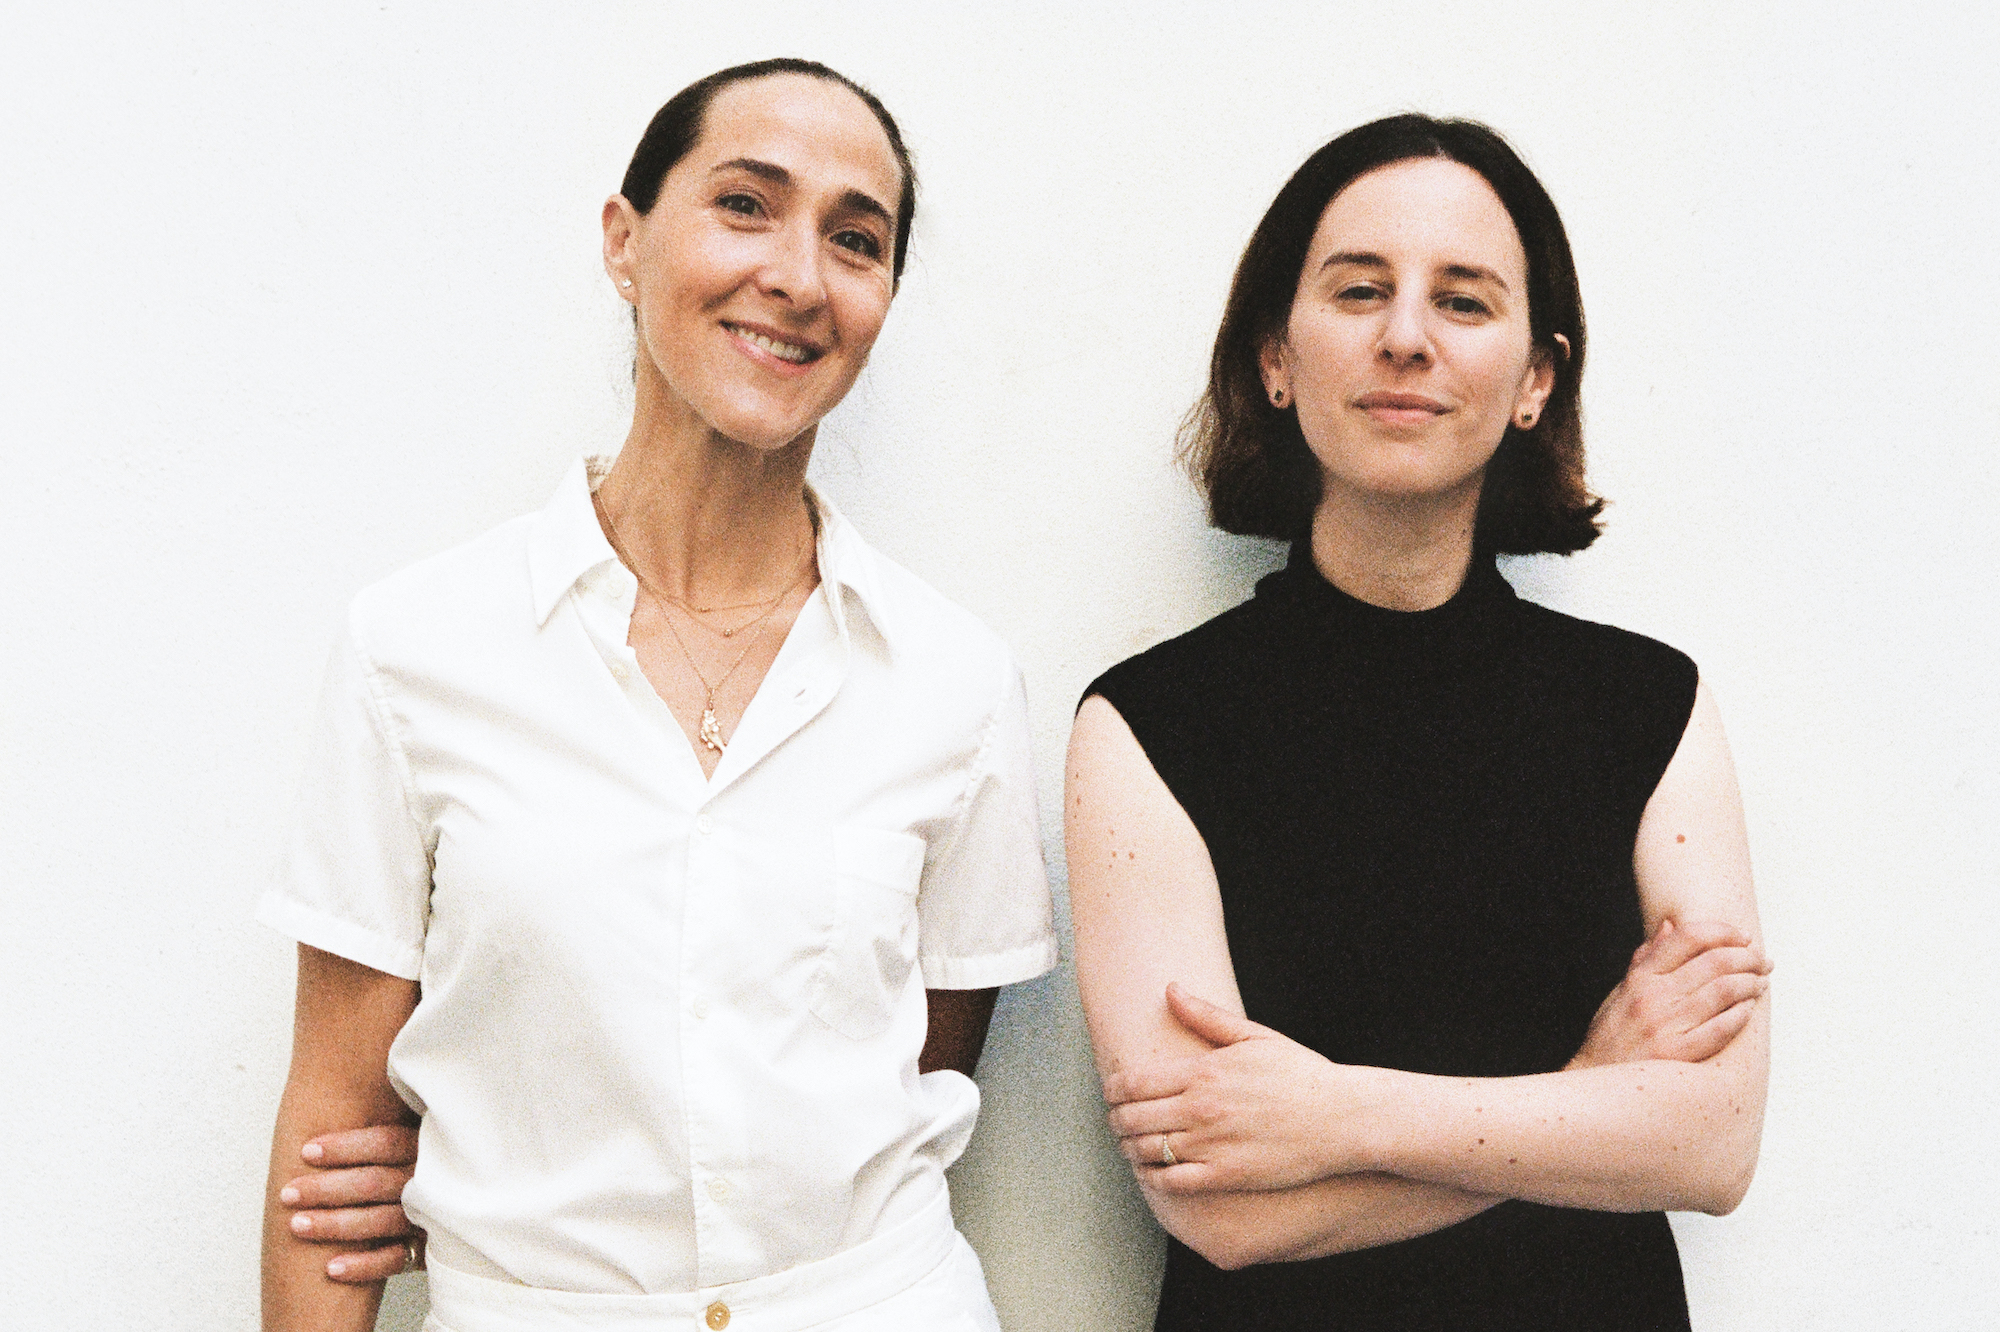 Chefs Gabriela Cámara and Jessica Koslow stand for a portrait.